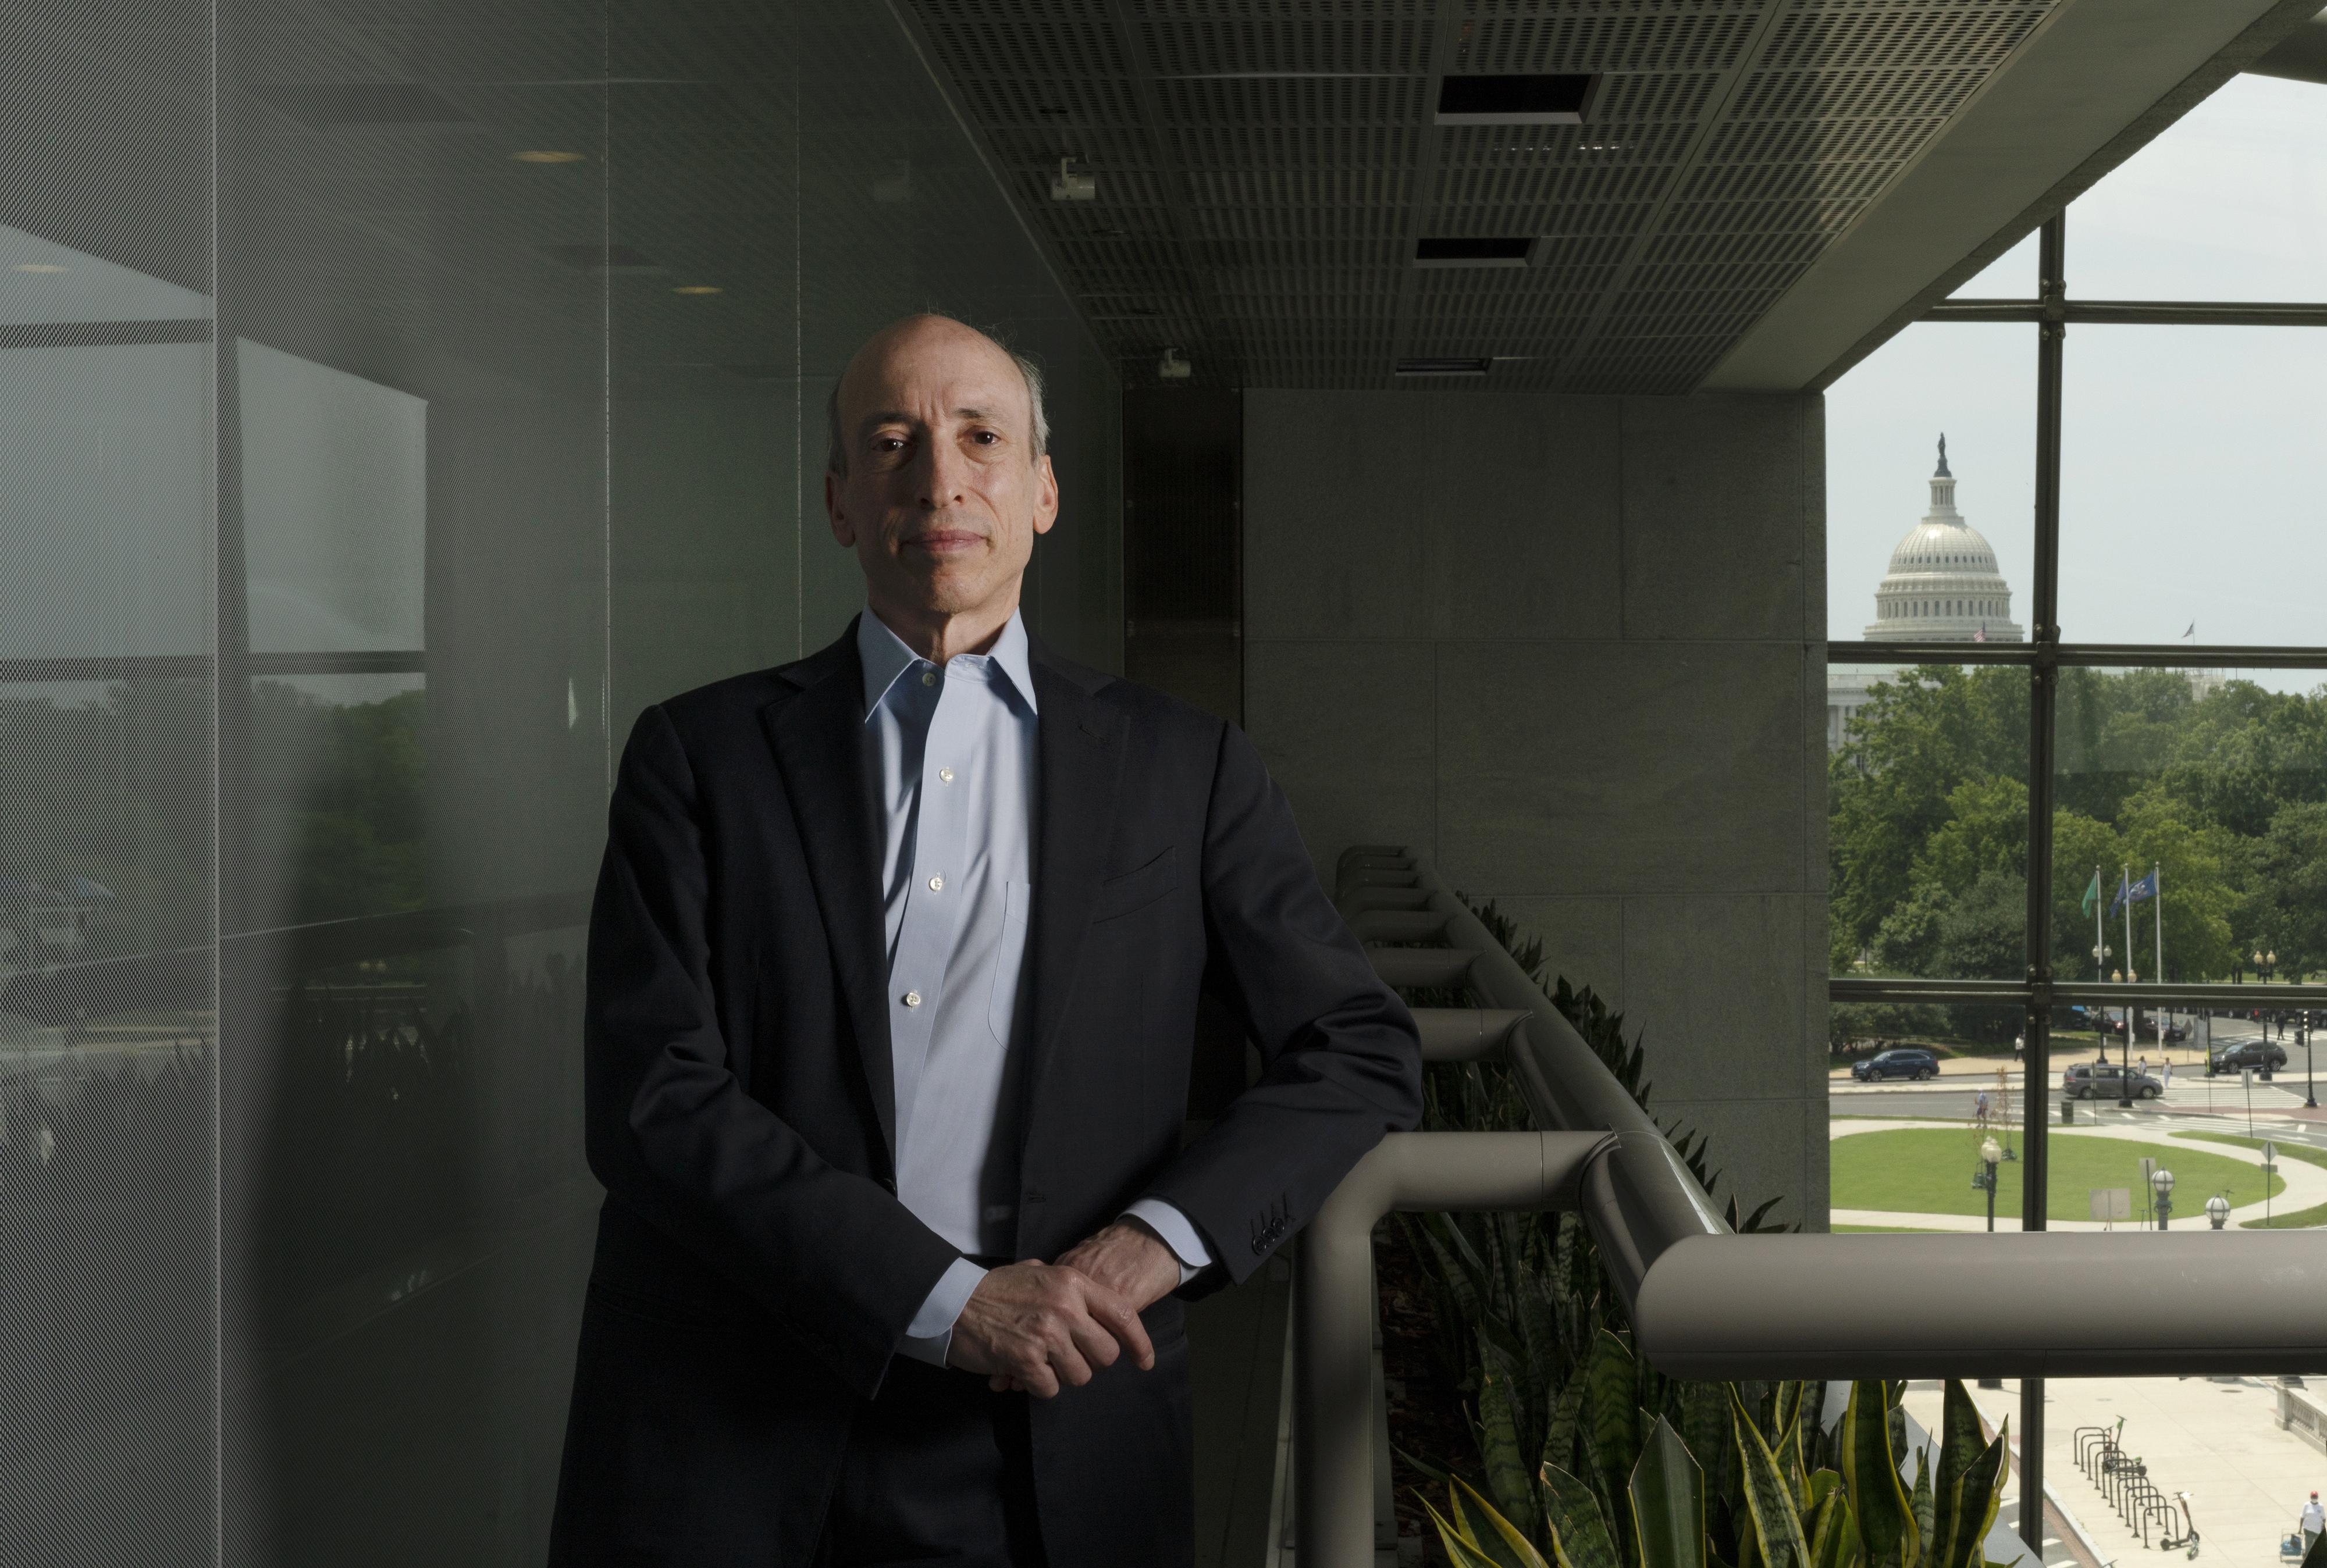 SEC Chairman Gensler Readies More Crypto Oversight To Protect Investors